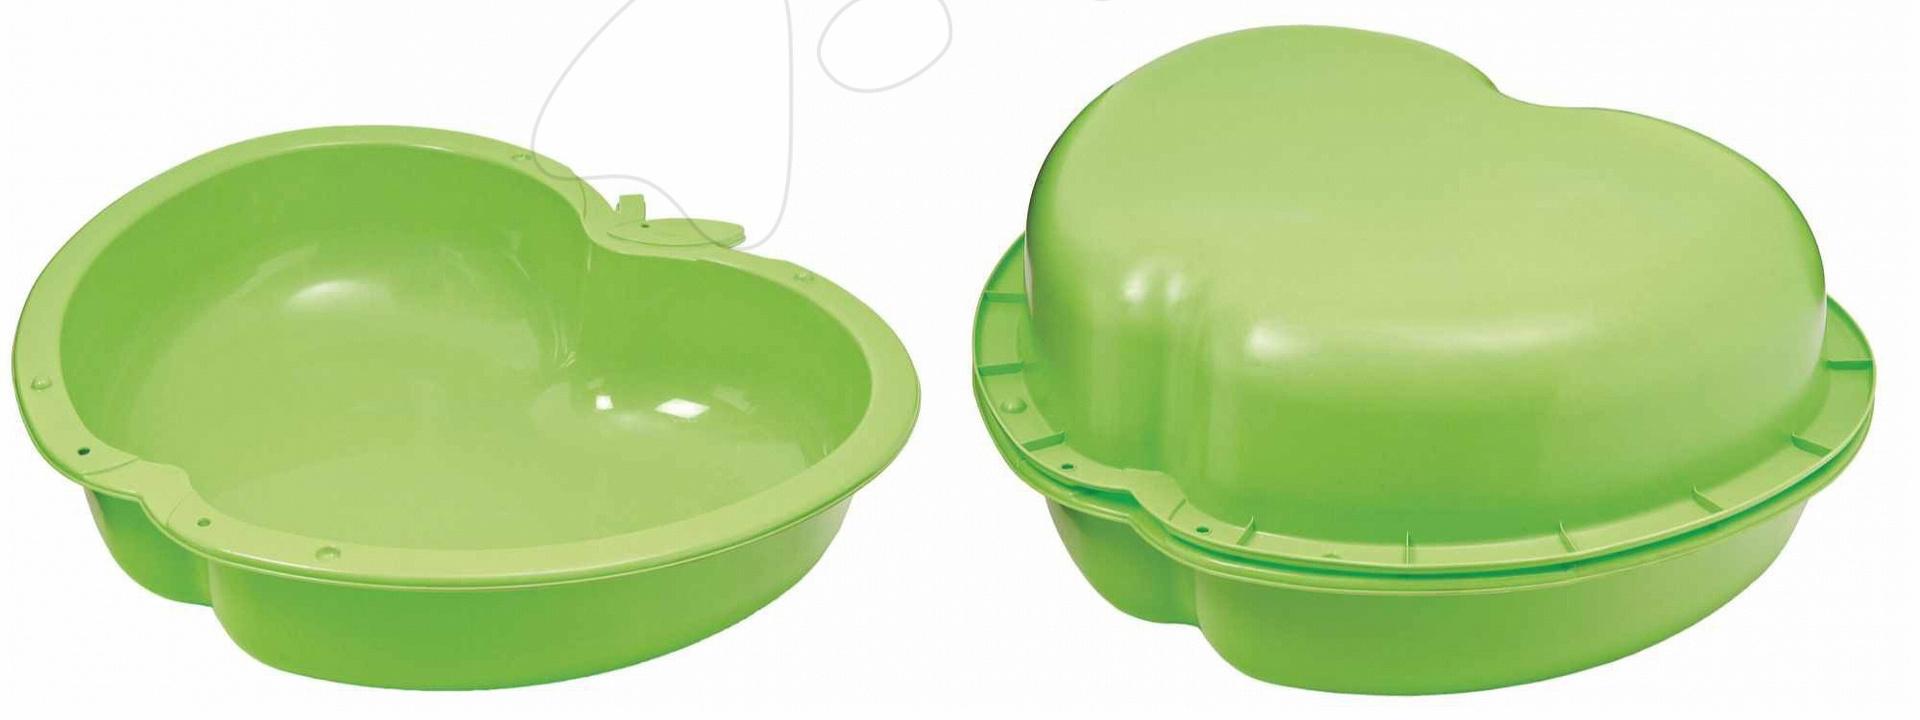 Pieskoviská pre deti - Set 2 pieskovísk Jablko Starplast objem 2x112 litrov zelené od 24 mes